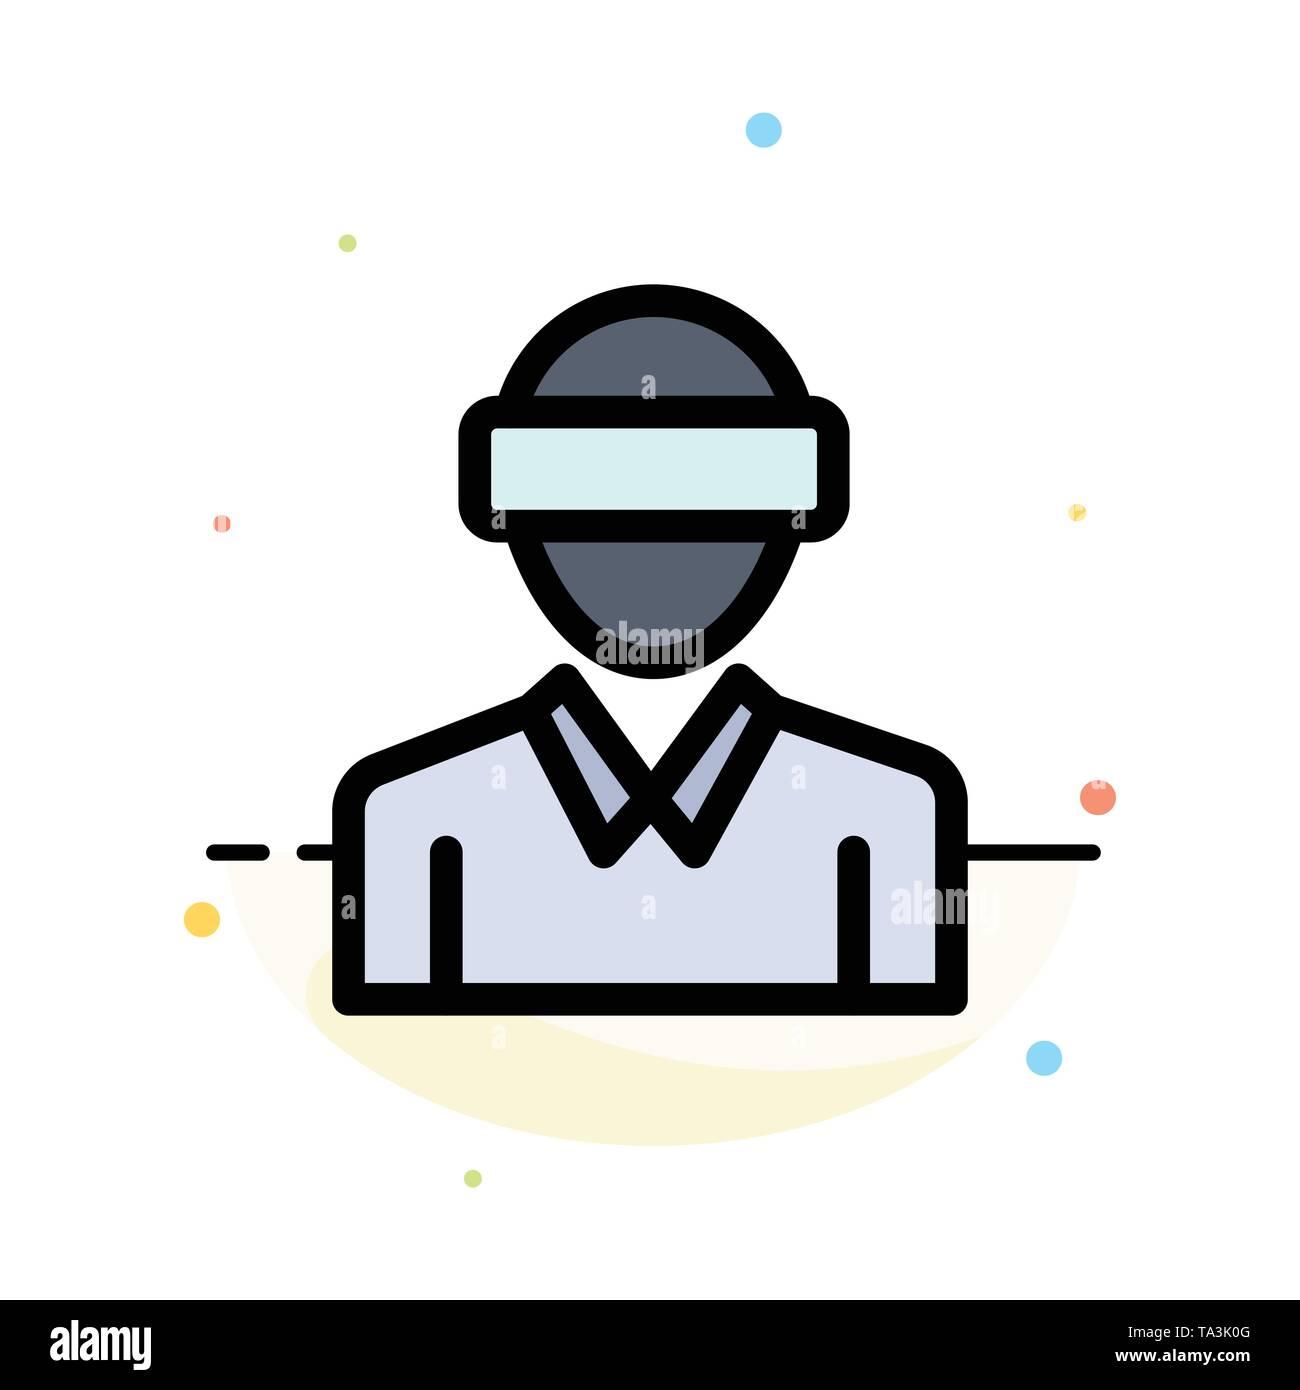 Gläser, Motion, Realität, Technik, man Abstrakte flachen Farbe Symbol Vorlage Stockbild